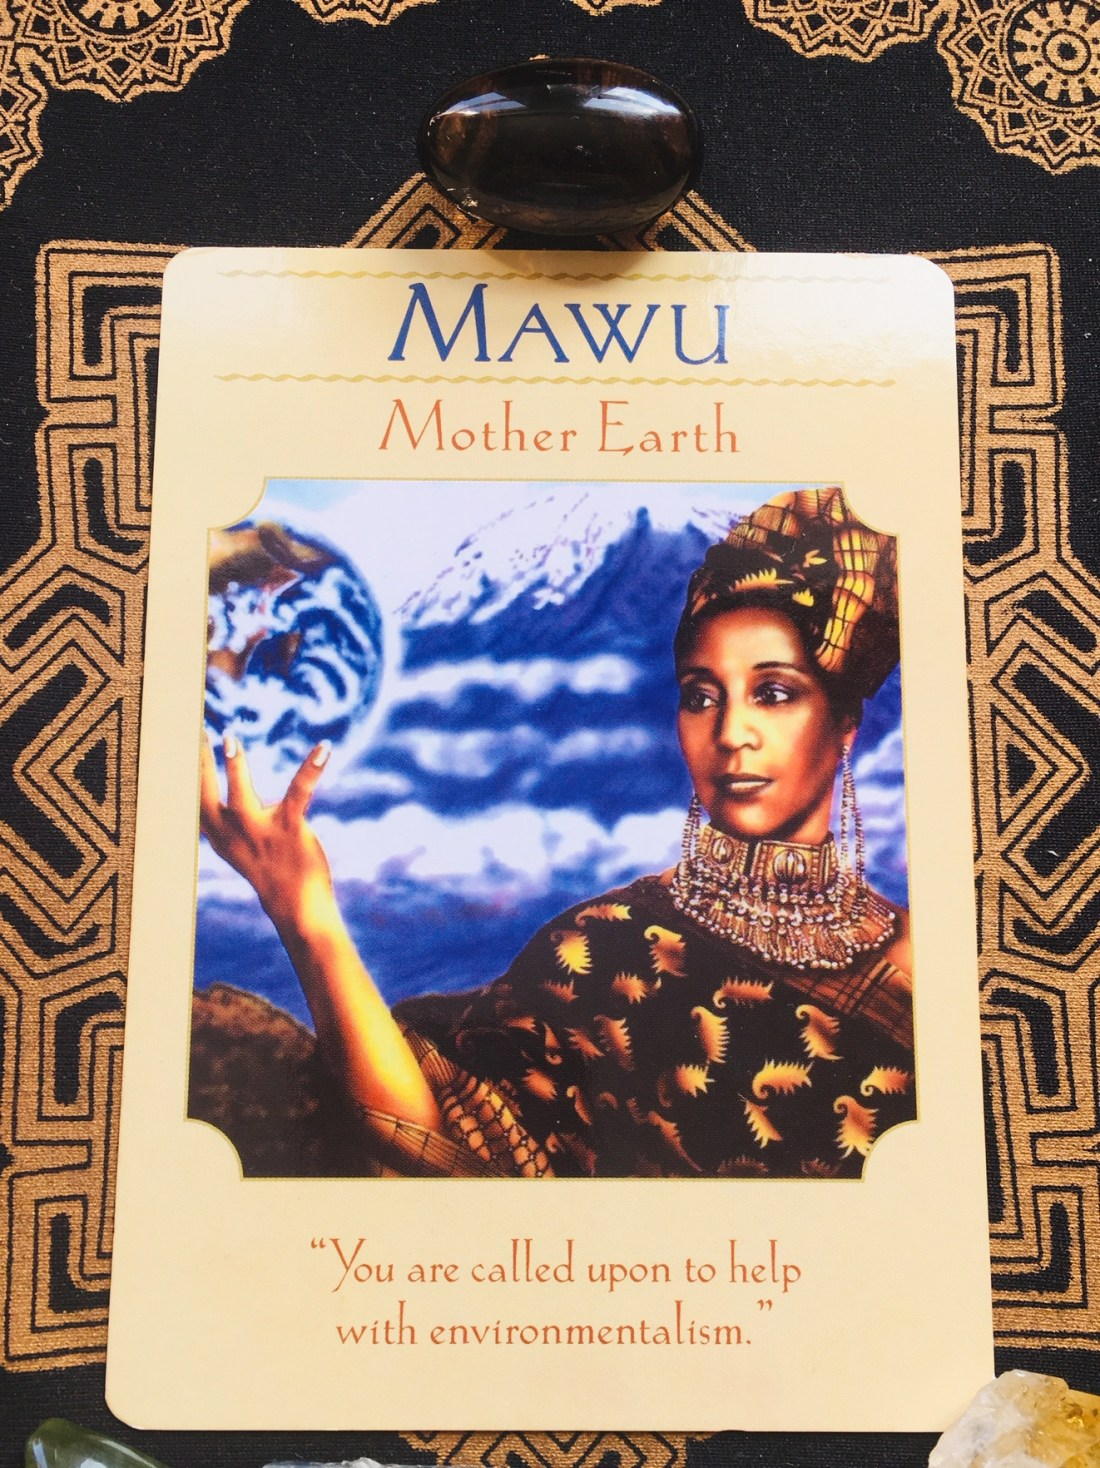 Mawu Mother Earth